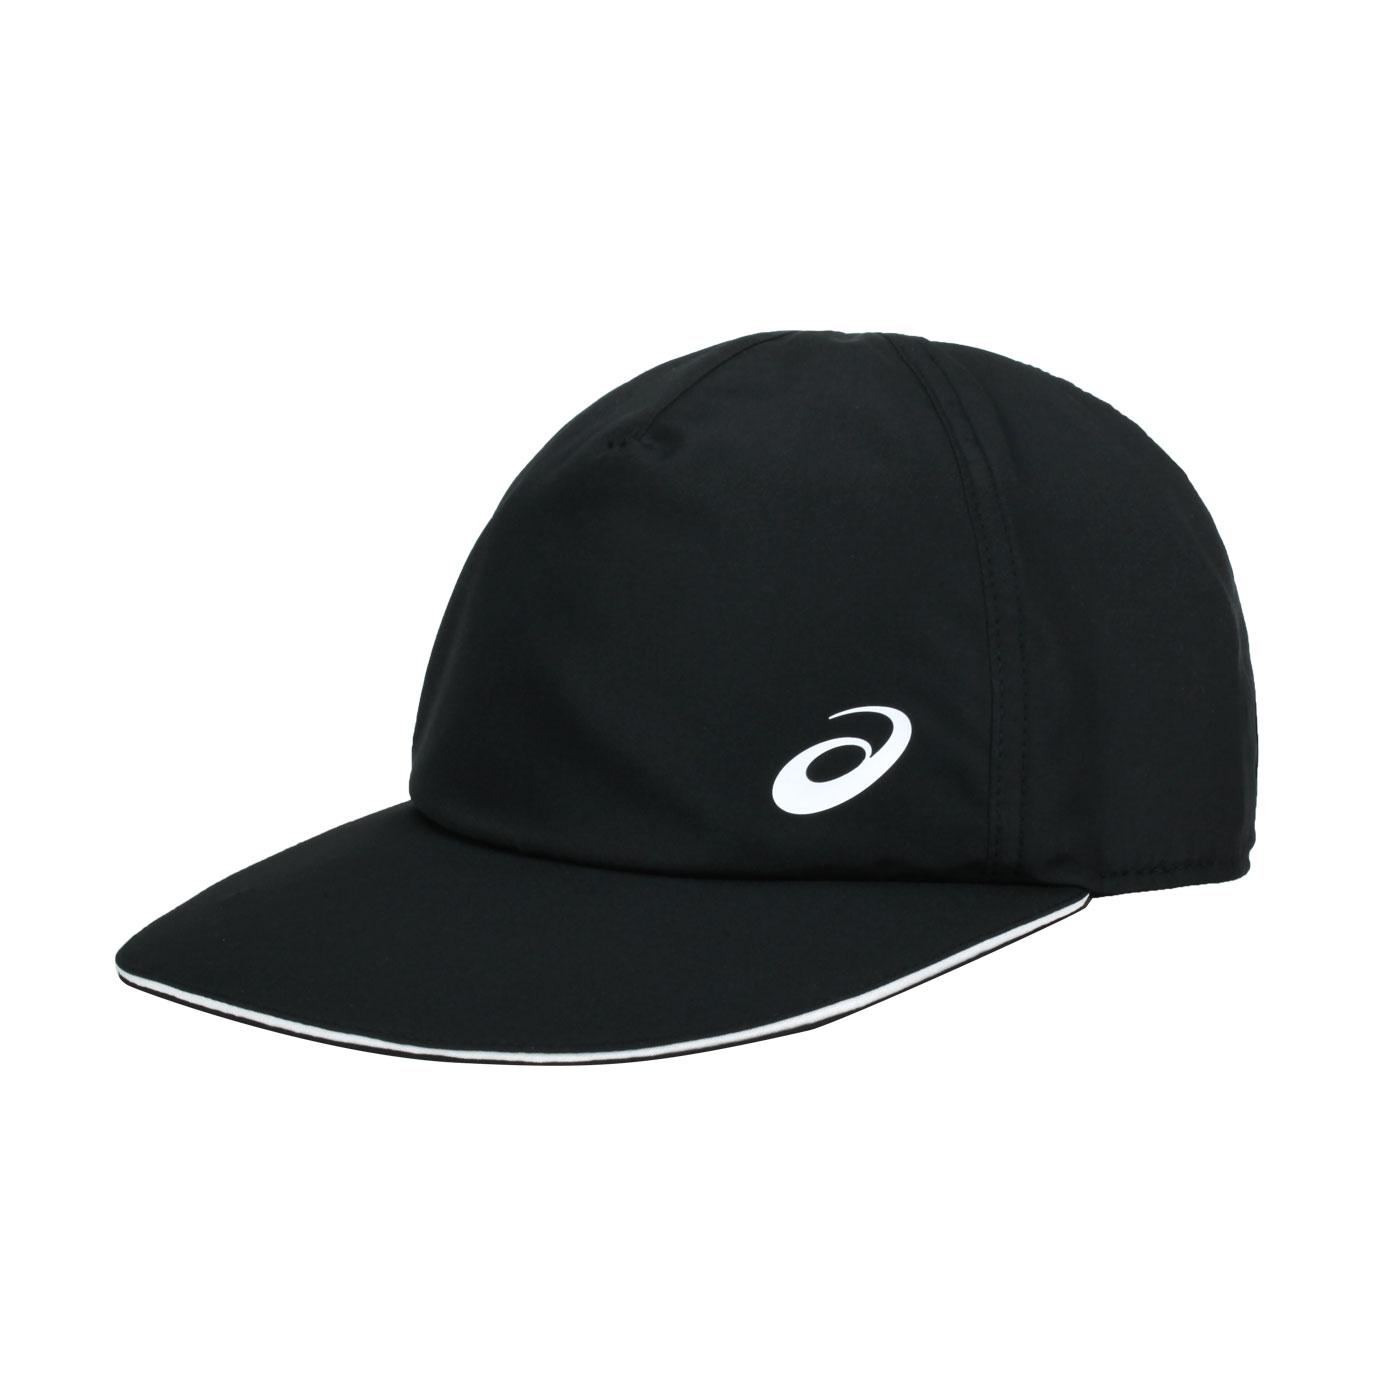 ASICS 平織帽 3043A048-002 - 黑白